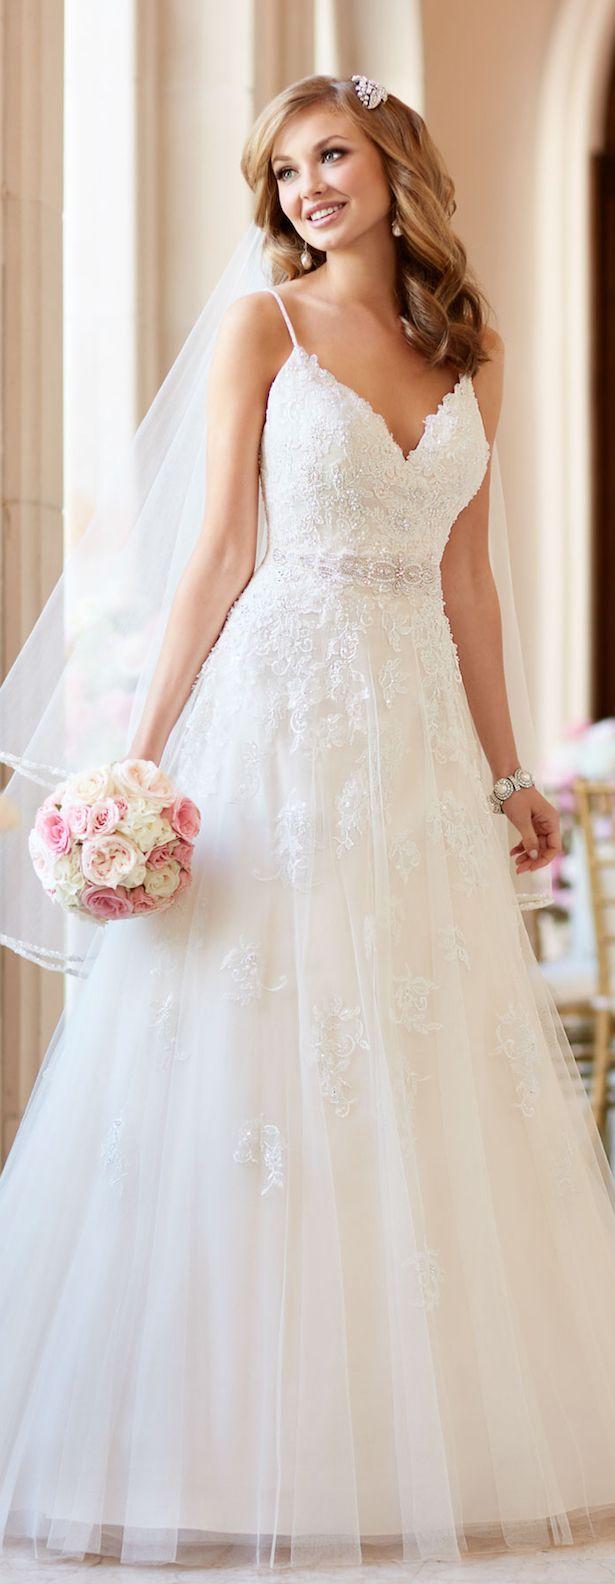 Wedding-Dresses-1196